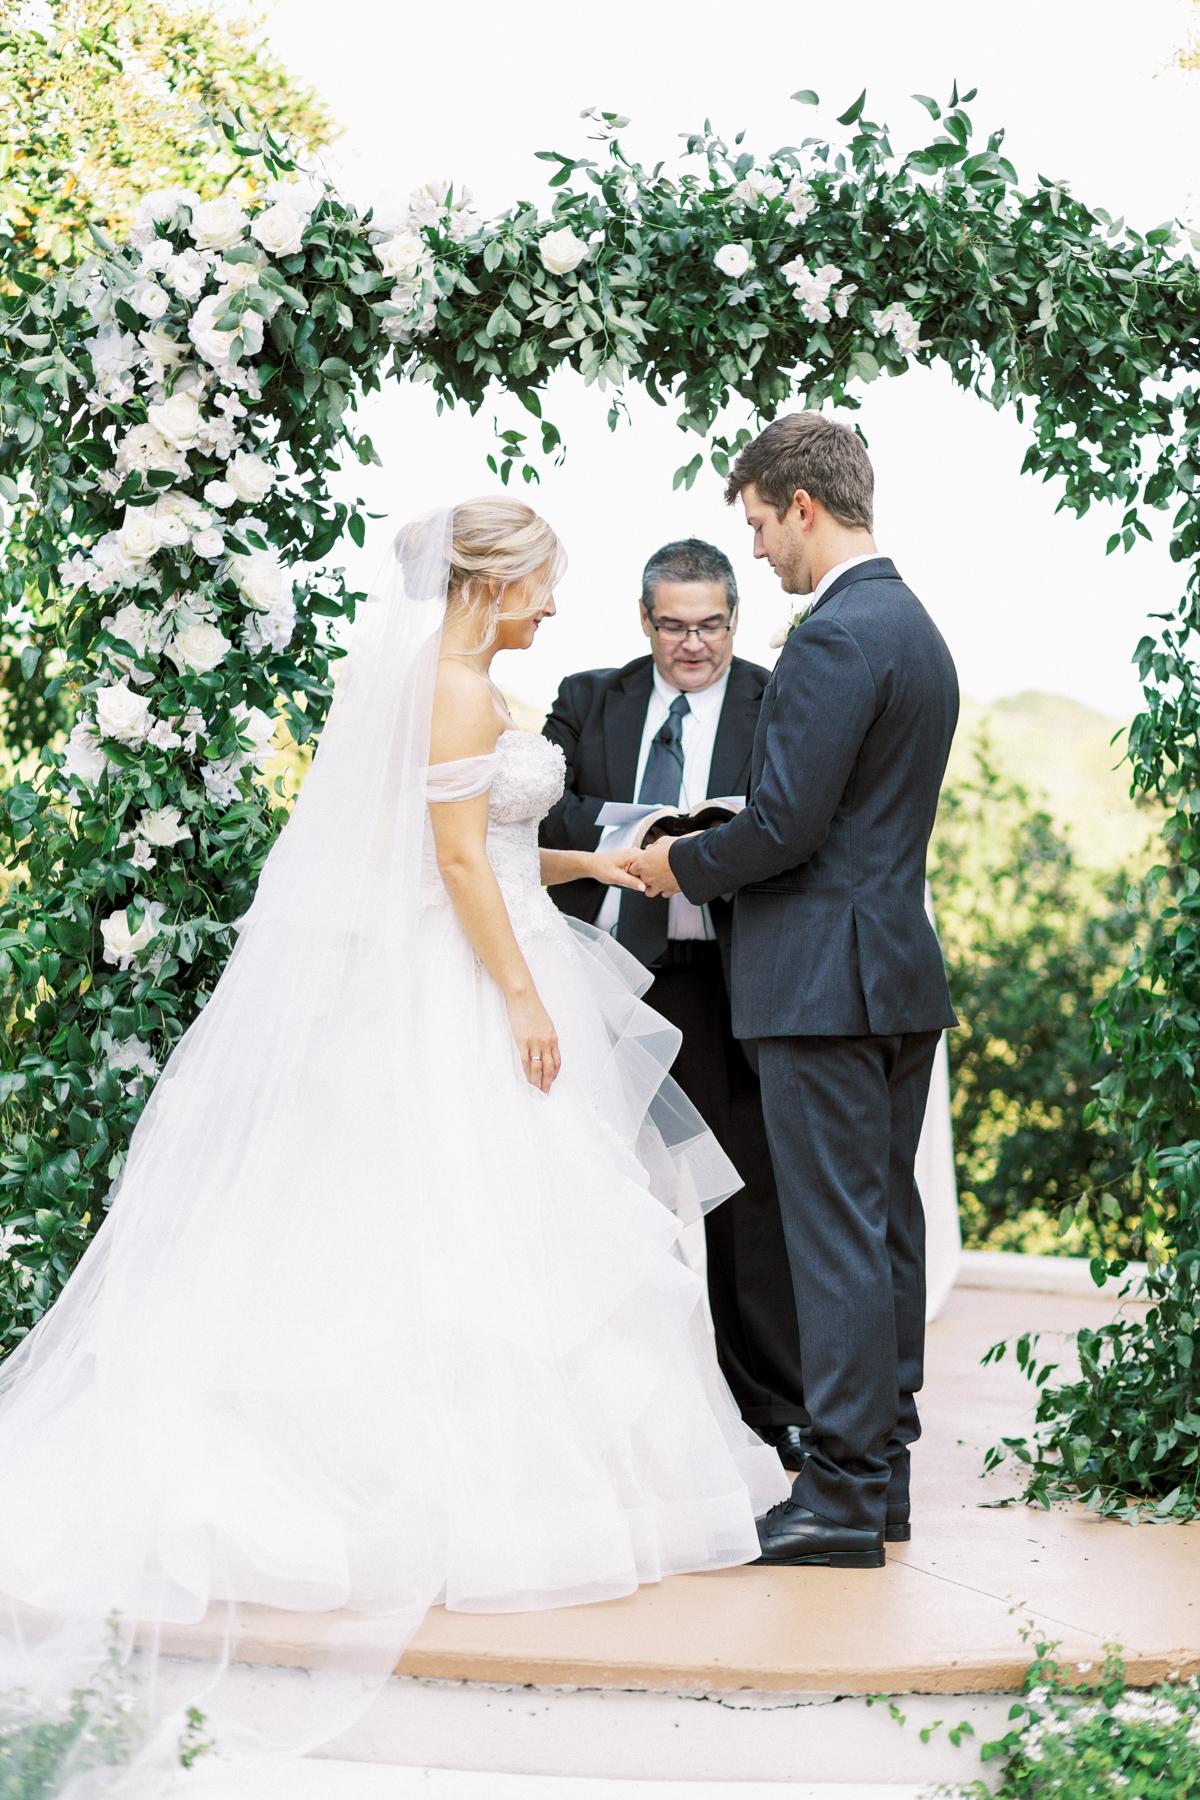 winmock-kinderton-wedding-042.jpg